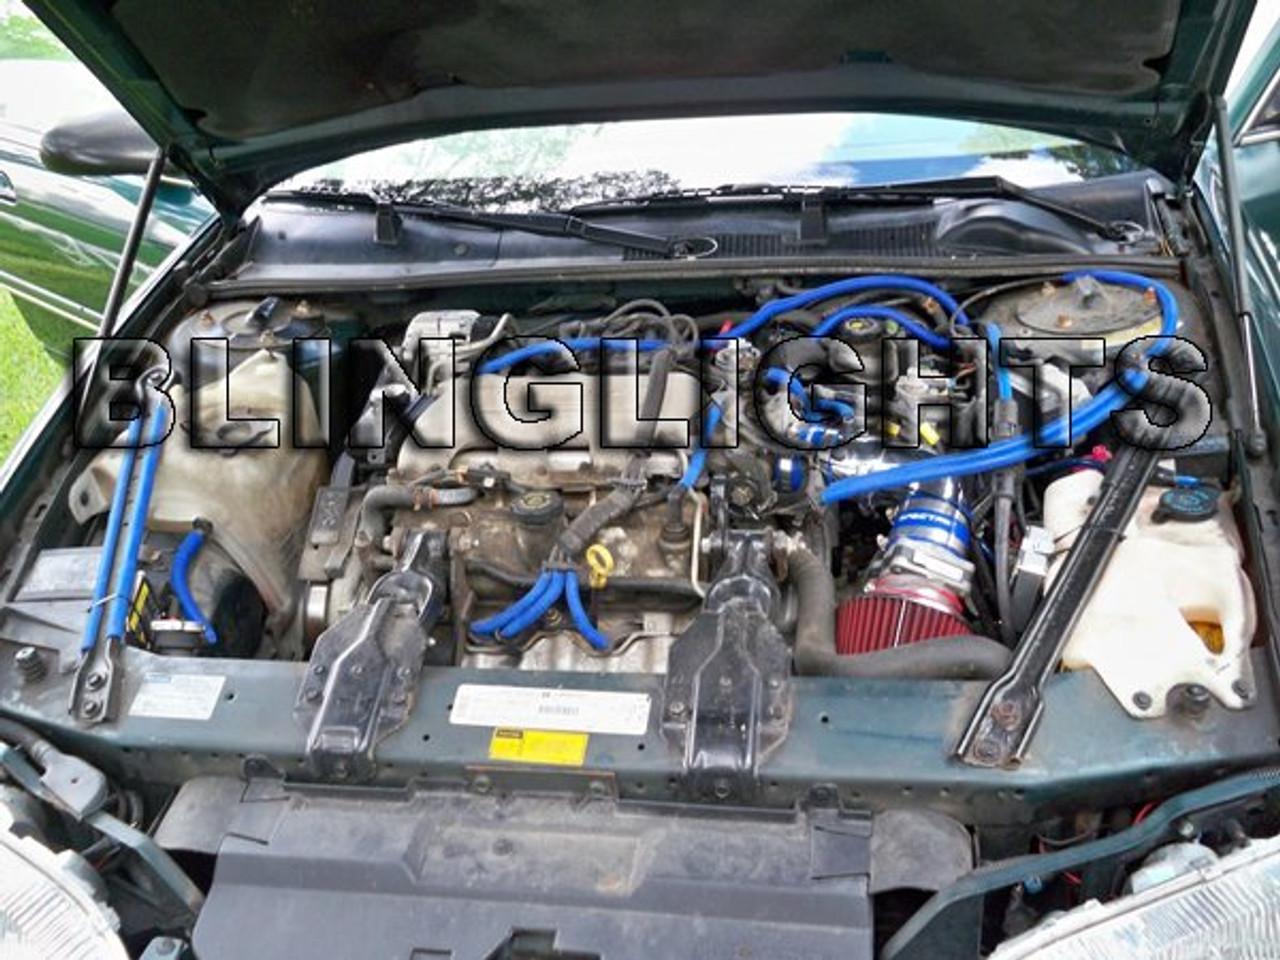 [SCHEMATICS_48DE]  1995 1996 1997 1998 1999 2000 2001 Chevy Lumina 3.1 L L82 V6 Engine Ram Air  Intake Kit Chevrolet - BlingLights.com | 2001 Chevrolet Lumina Wiring Harness |  | BlingLights.com